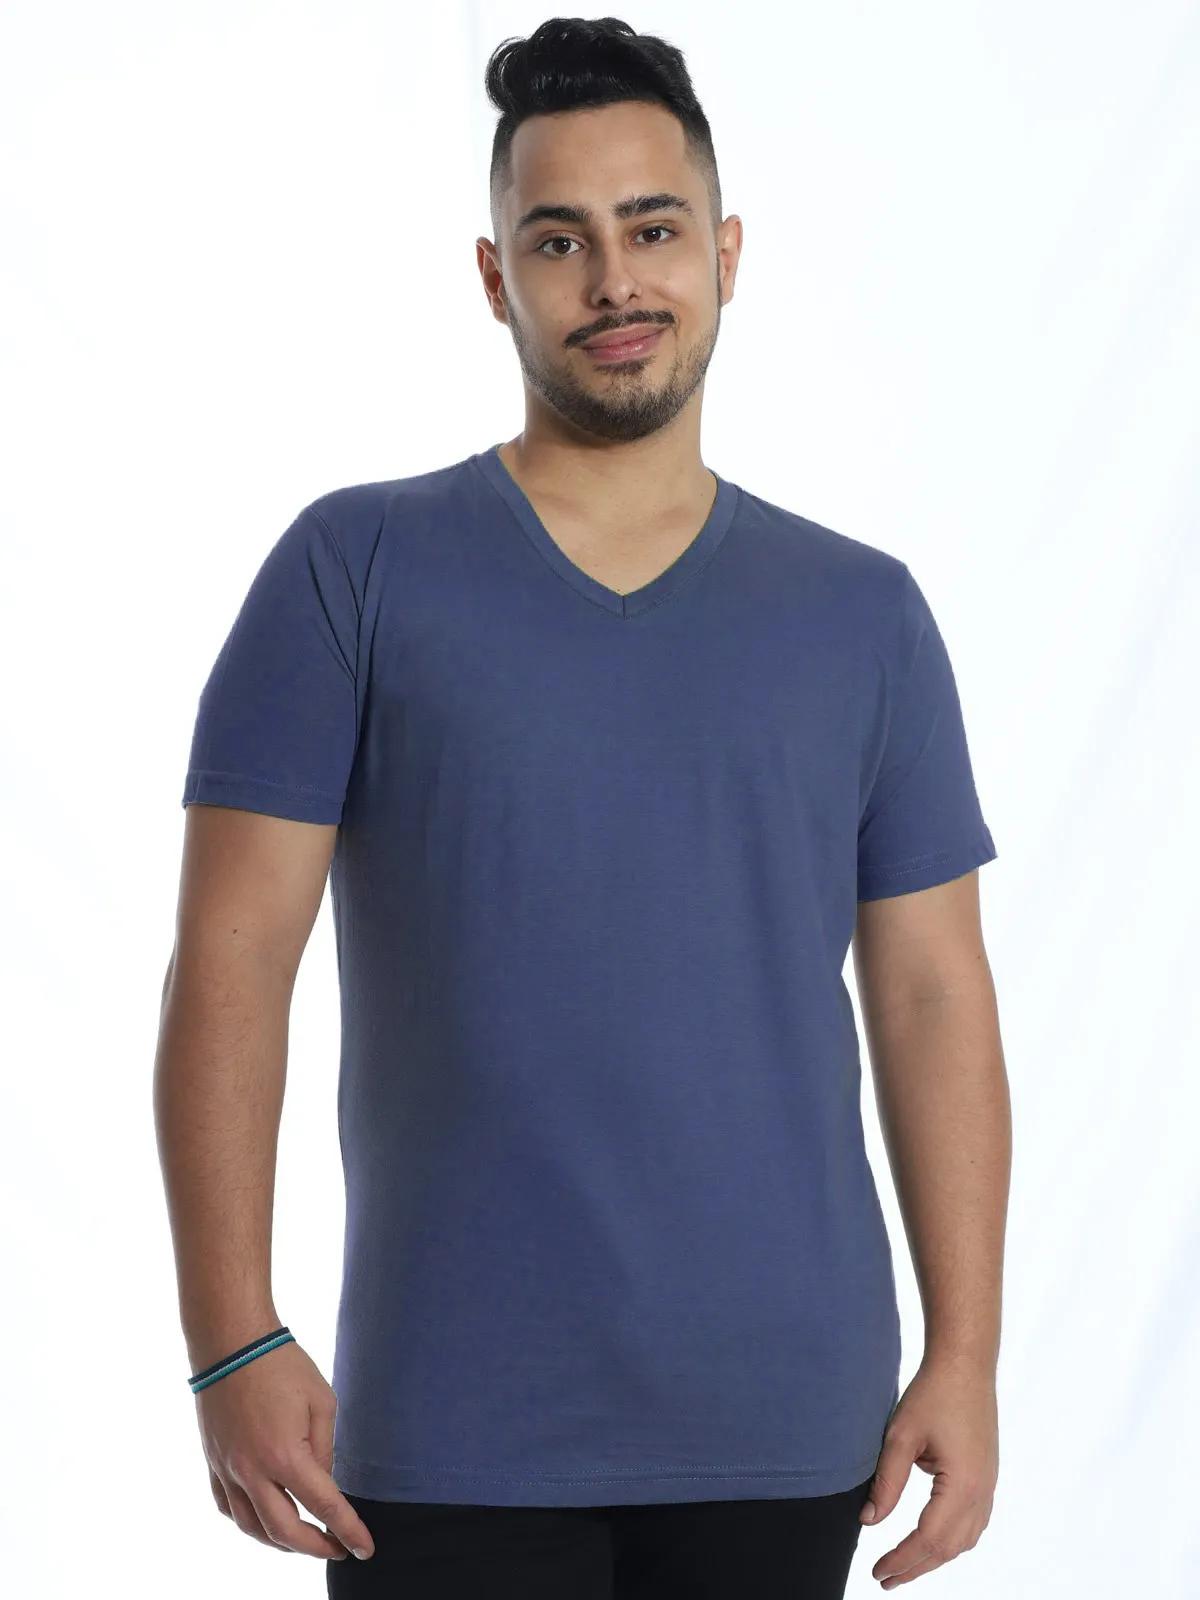 Camiseta Masculina Decote V. Algodão Slim Fit Lisa Jeans